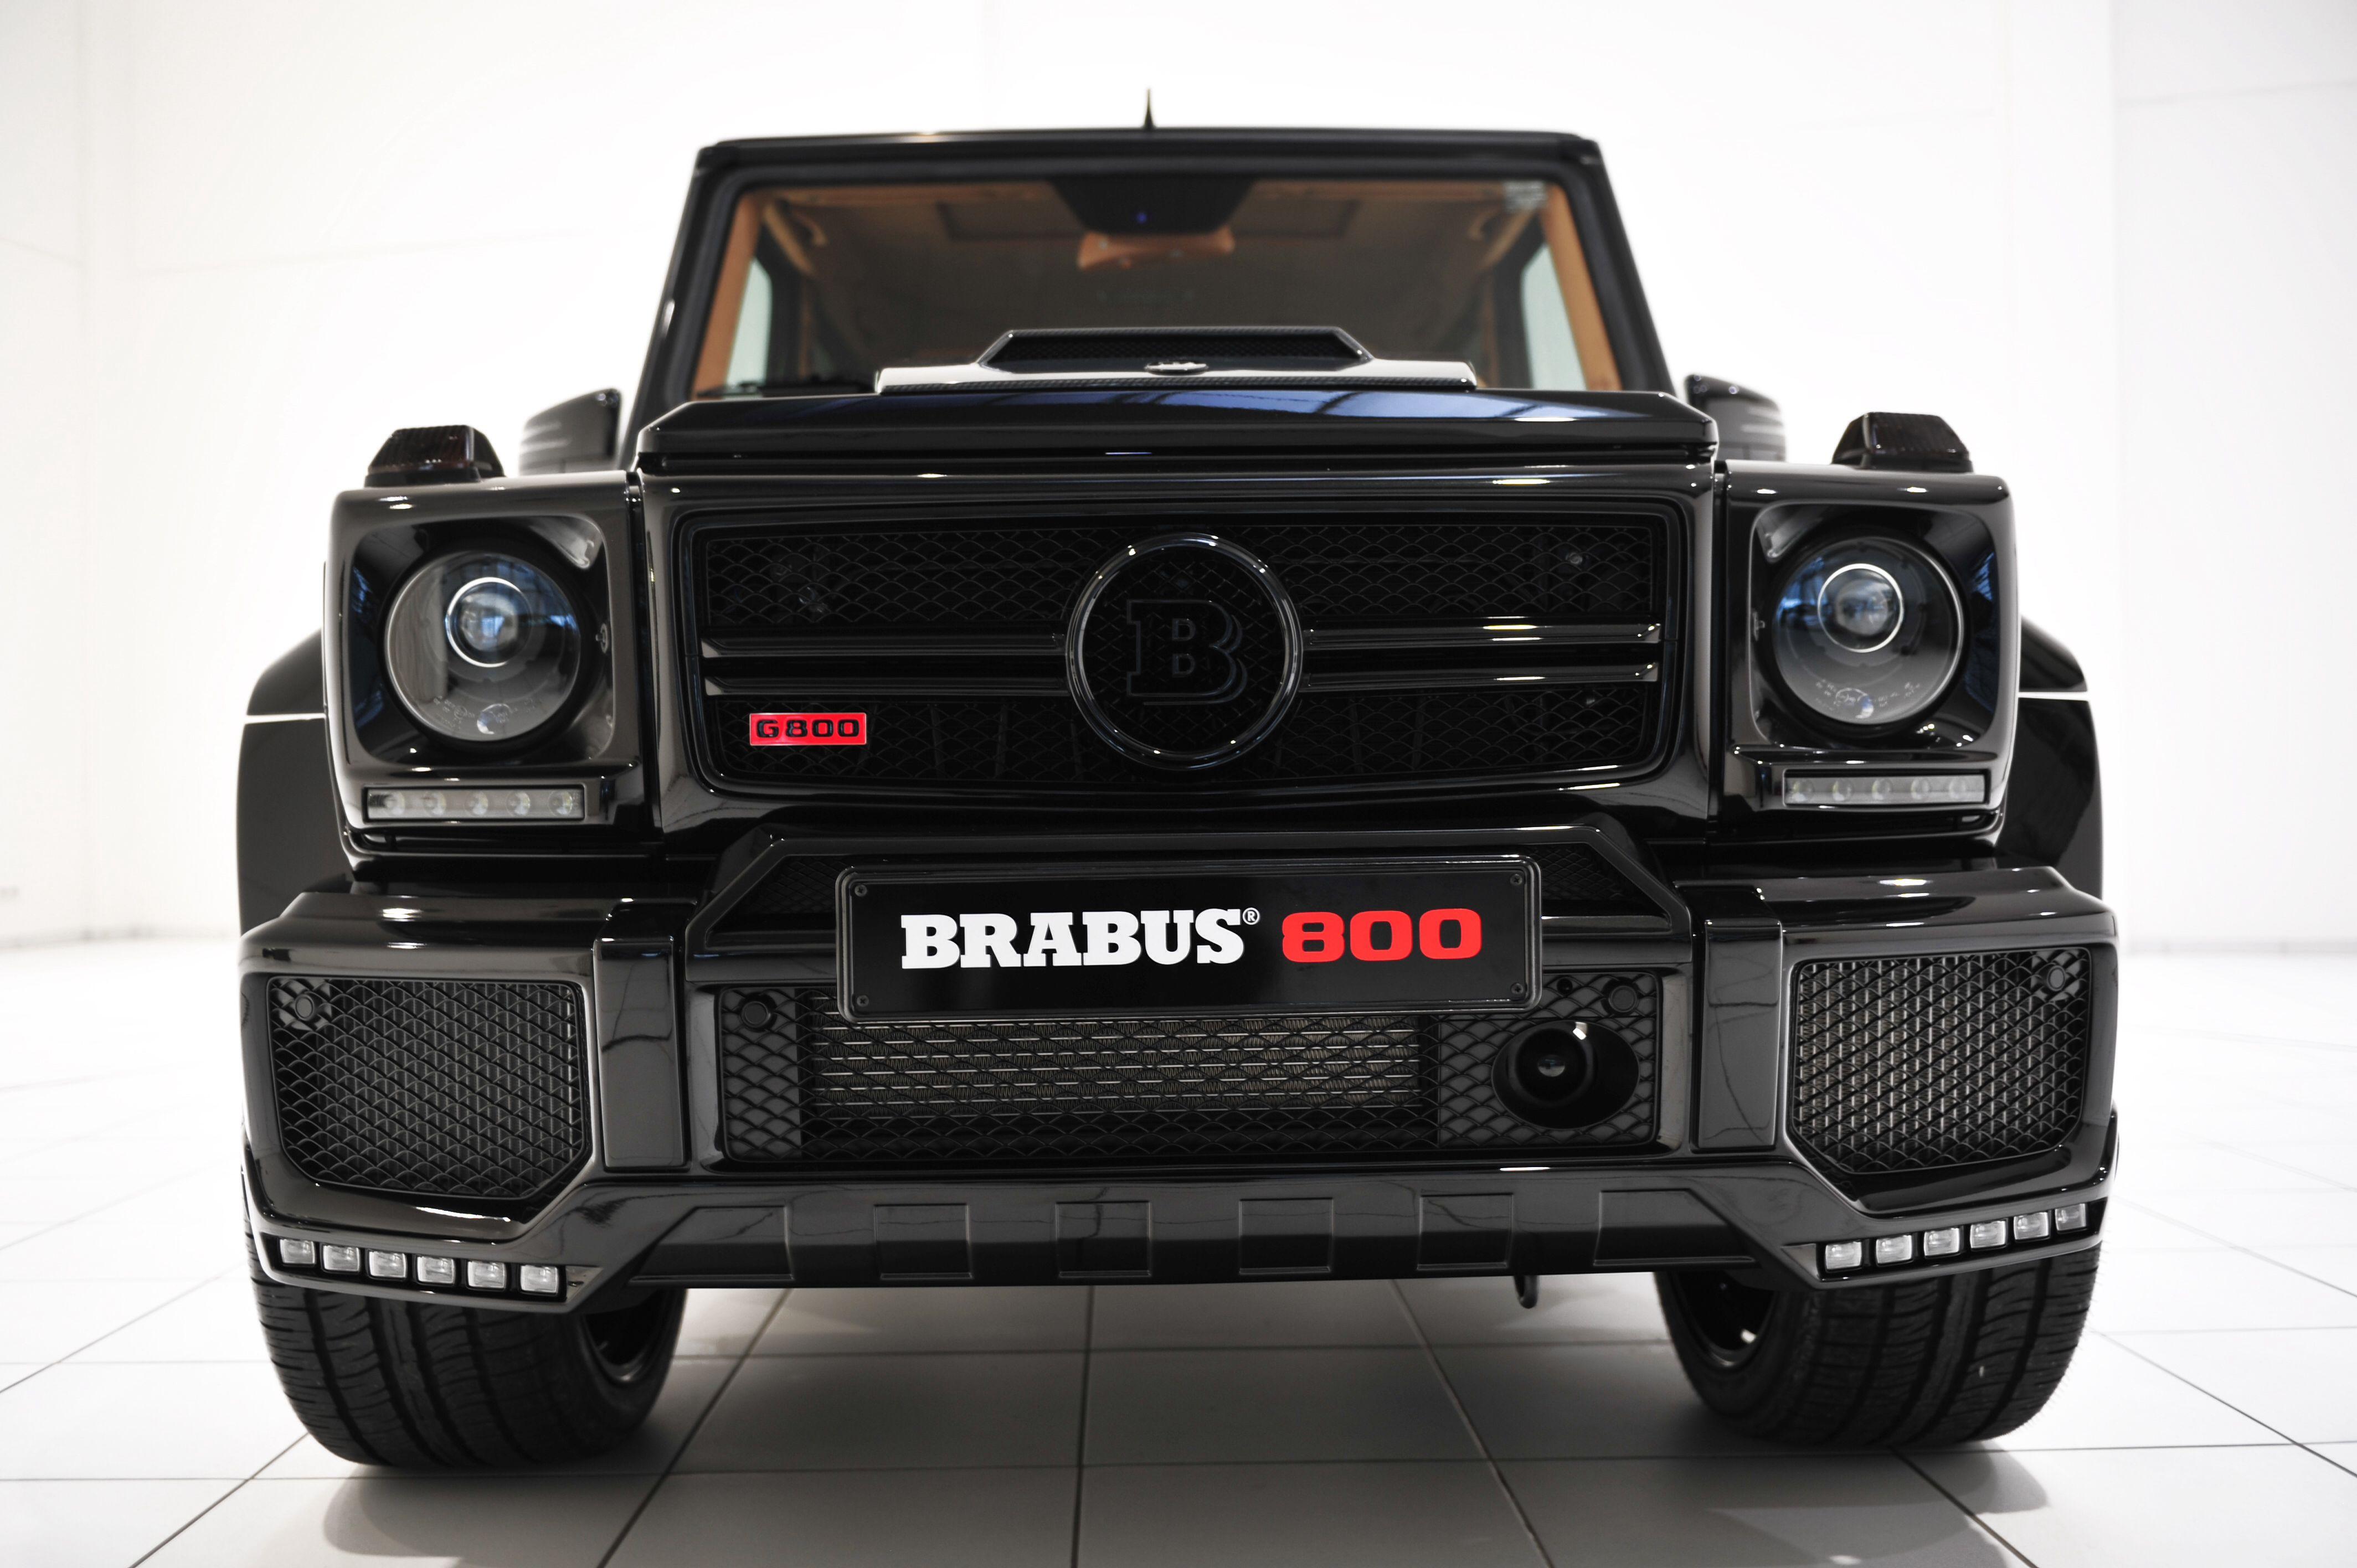 2013 Brabus G800 Widestar 4x4 Pinterest